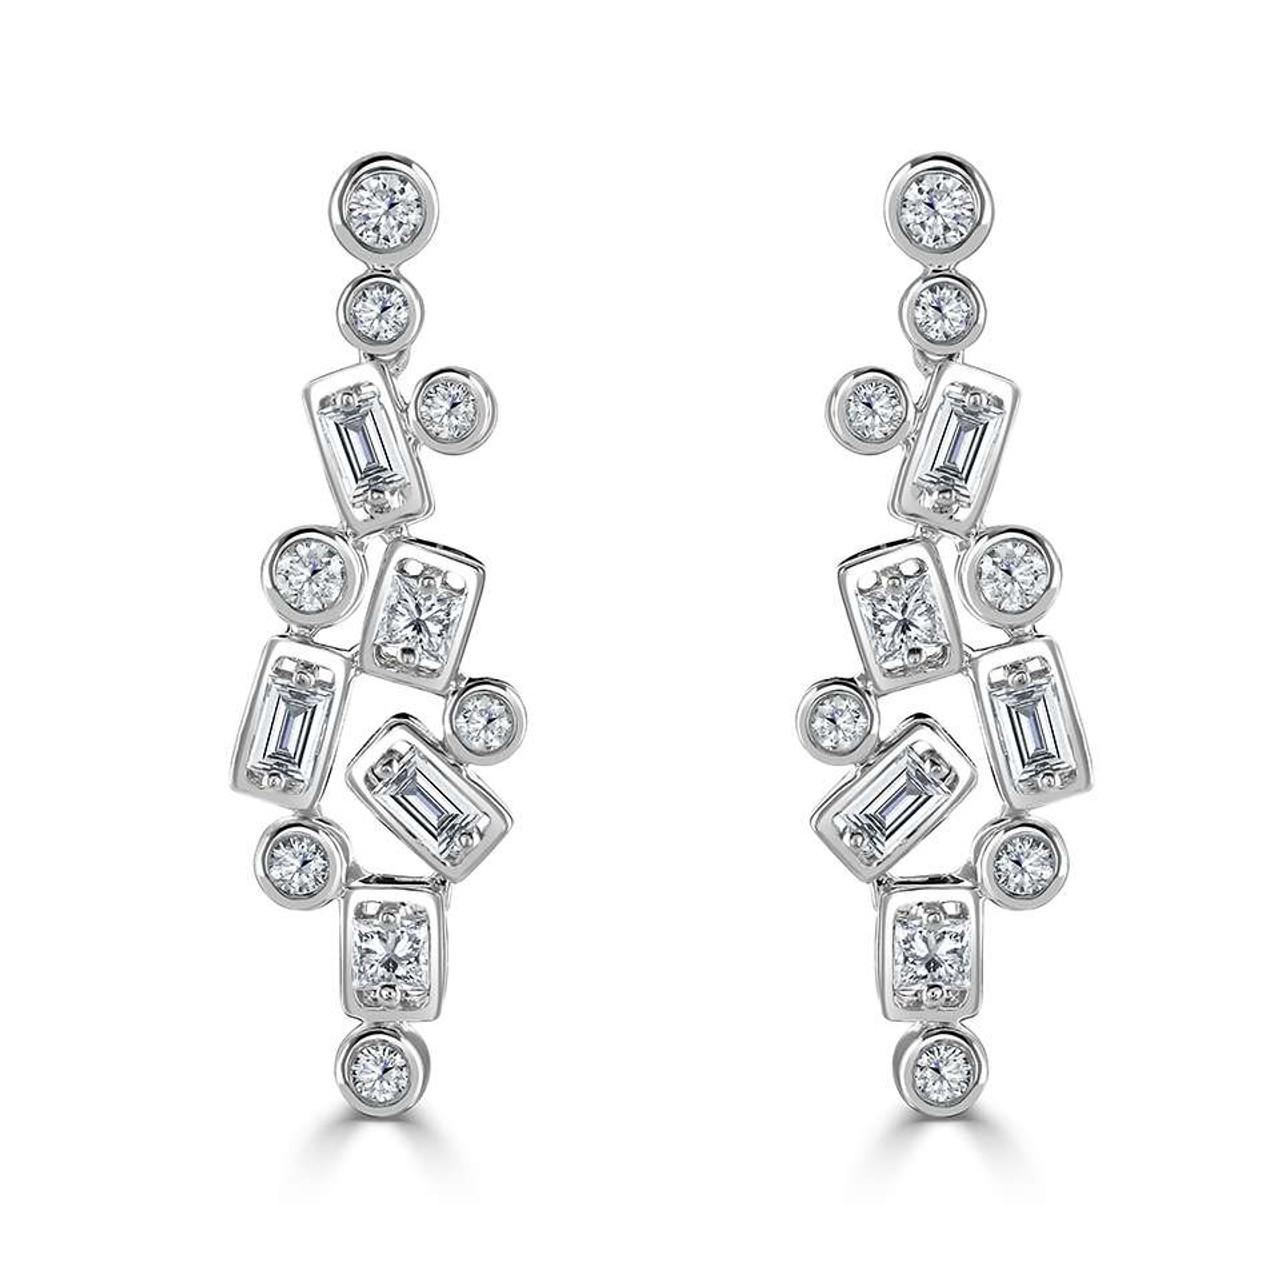 18ct White Gold Diamond Confetti Drop Earrings